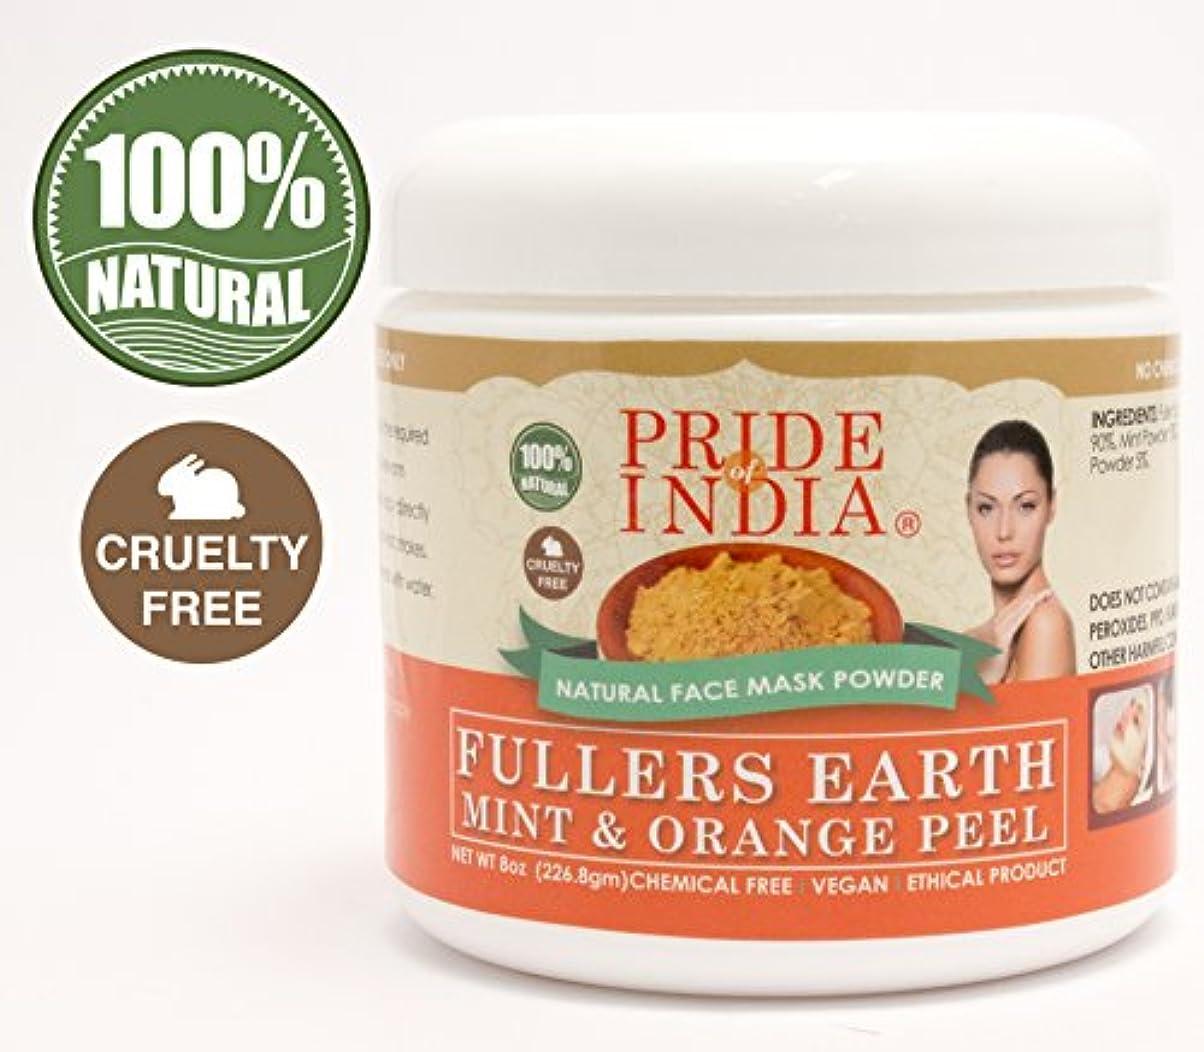 Pride Of India/ミントとオレンジピール、半ポンドジャーワットフラー土ディープクレンジングインドの粘土治癒フェイスマスクパウダー、自然